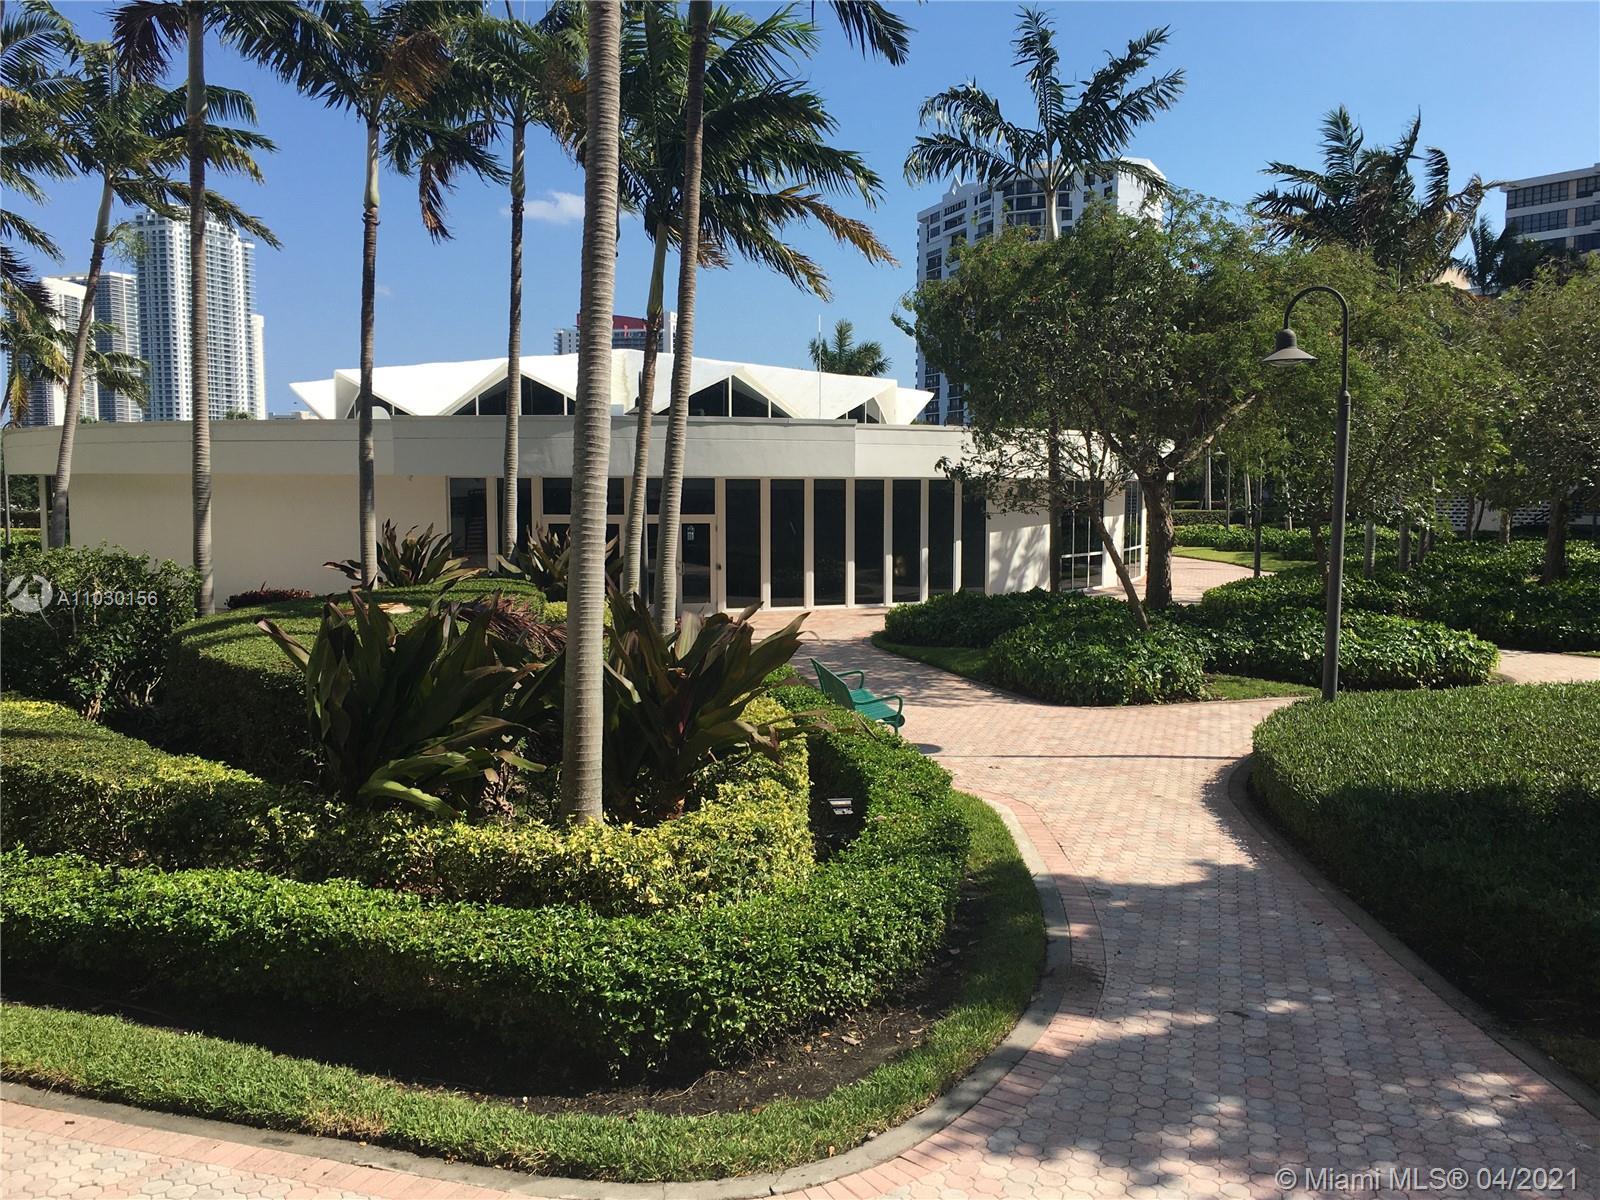 Photo of 2500 Parkview Dr #1108, Hallandale Beach, Florida, 33009 - Tennis Couts